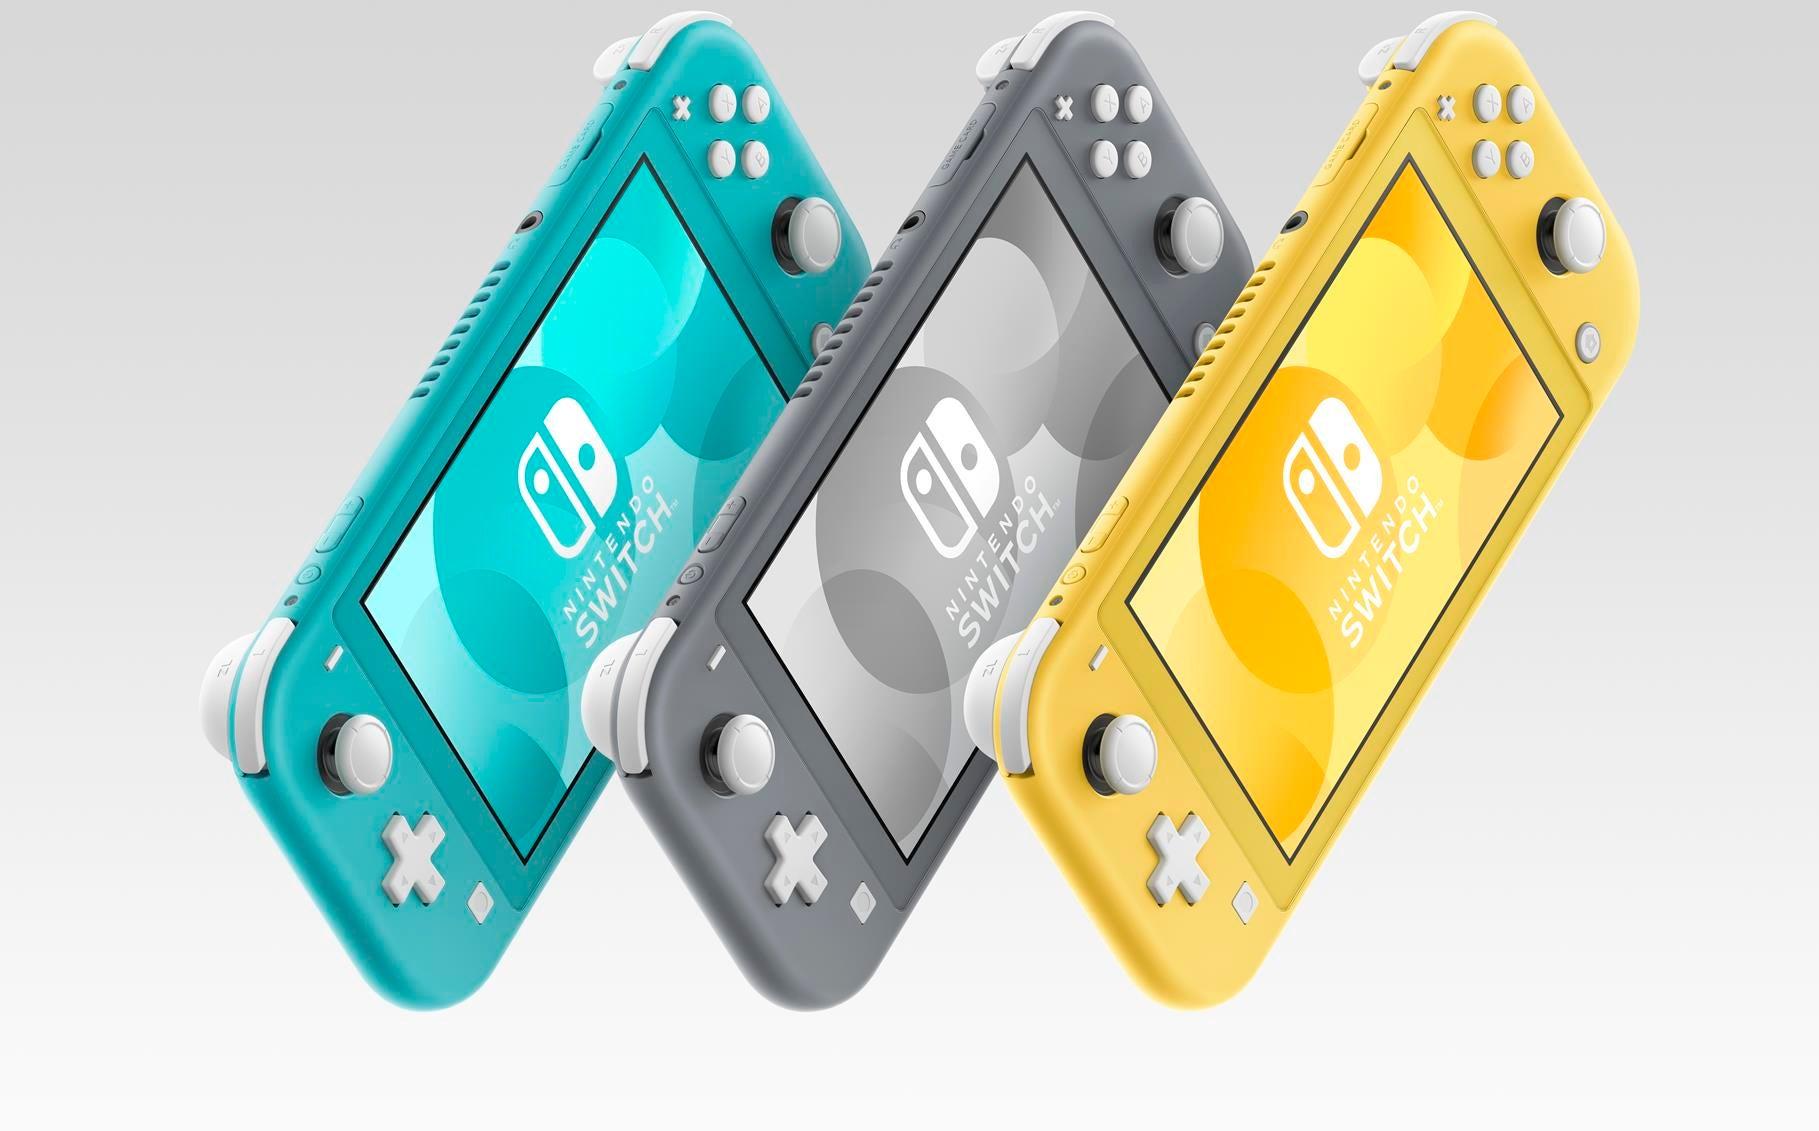 Image for Switch lifetime sales hit 41.7 million units, Switch Lite sold 1.95 million units within two weeks